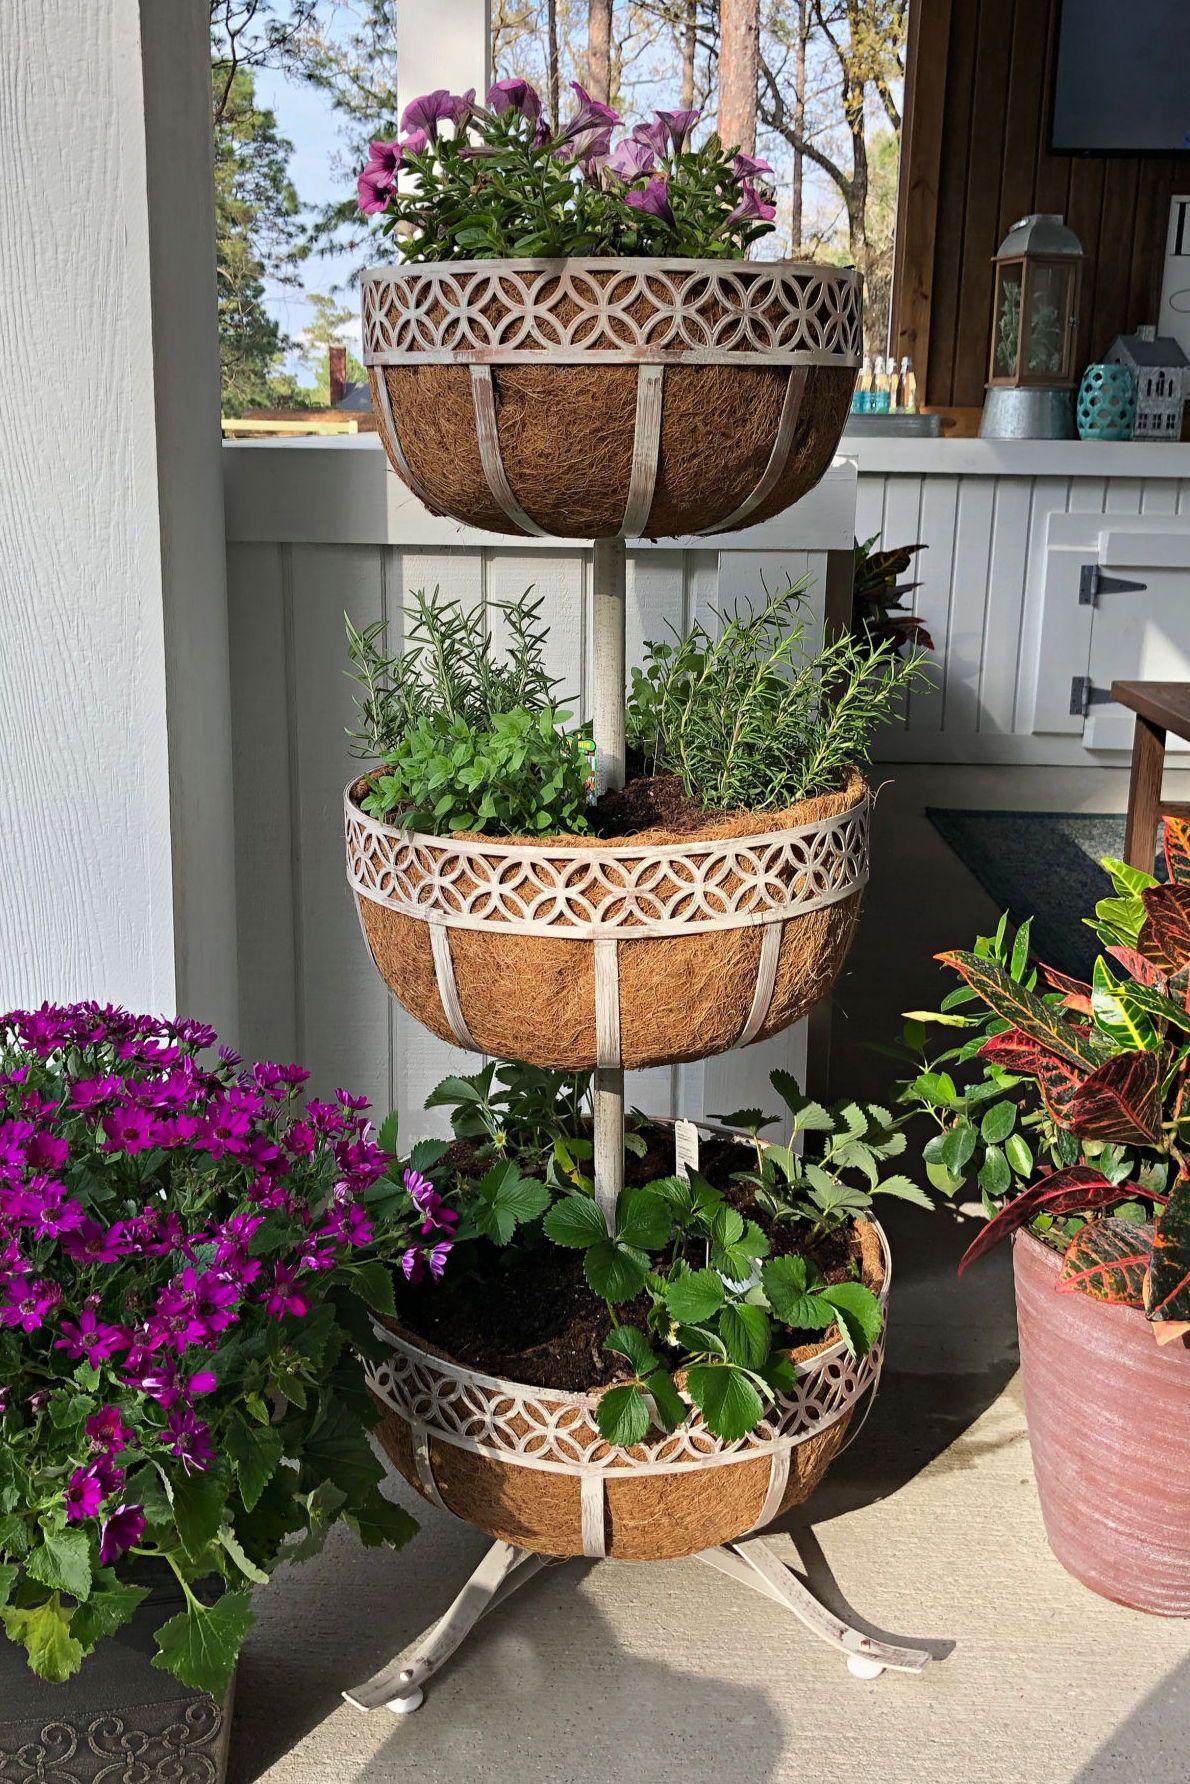 288f7fd0d25af0f78fa96299581b3c2f - Better Homes And Gardens Flowers Walmart